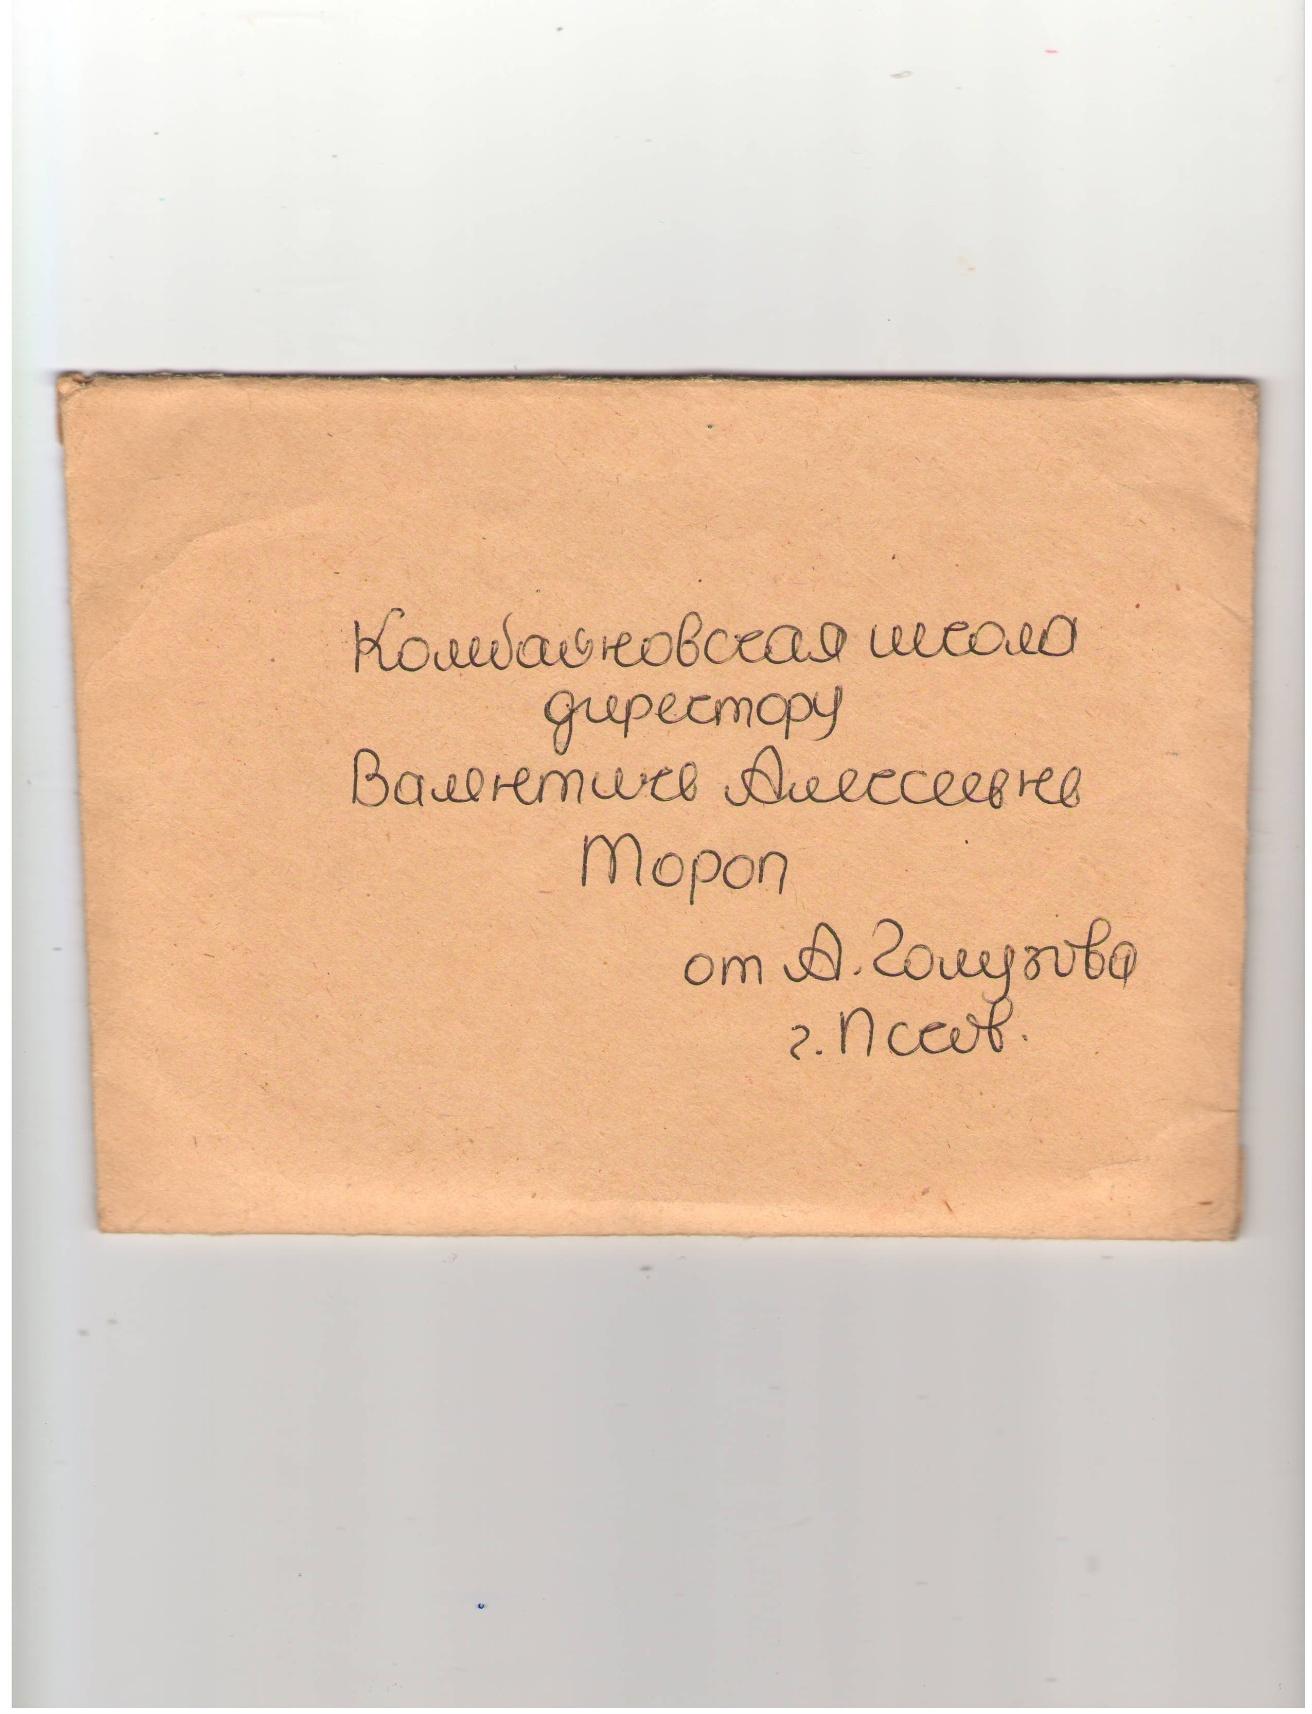 C:\Documents and Settings\СоцПед\Рабочий стол\2013-11-18\21.06.1988\Изображение0004.JPG